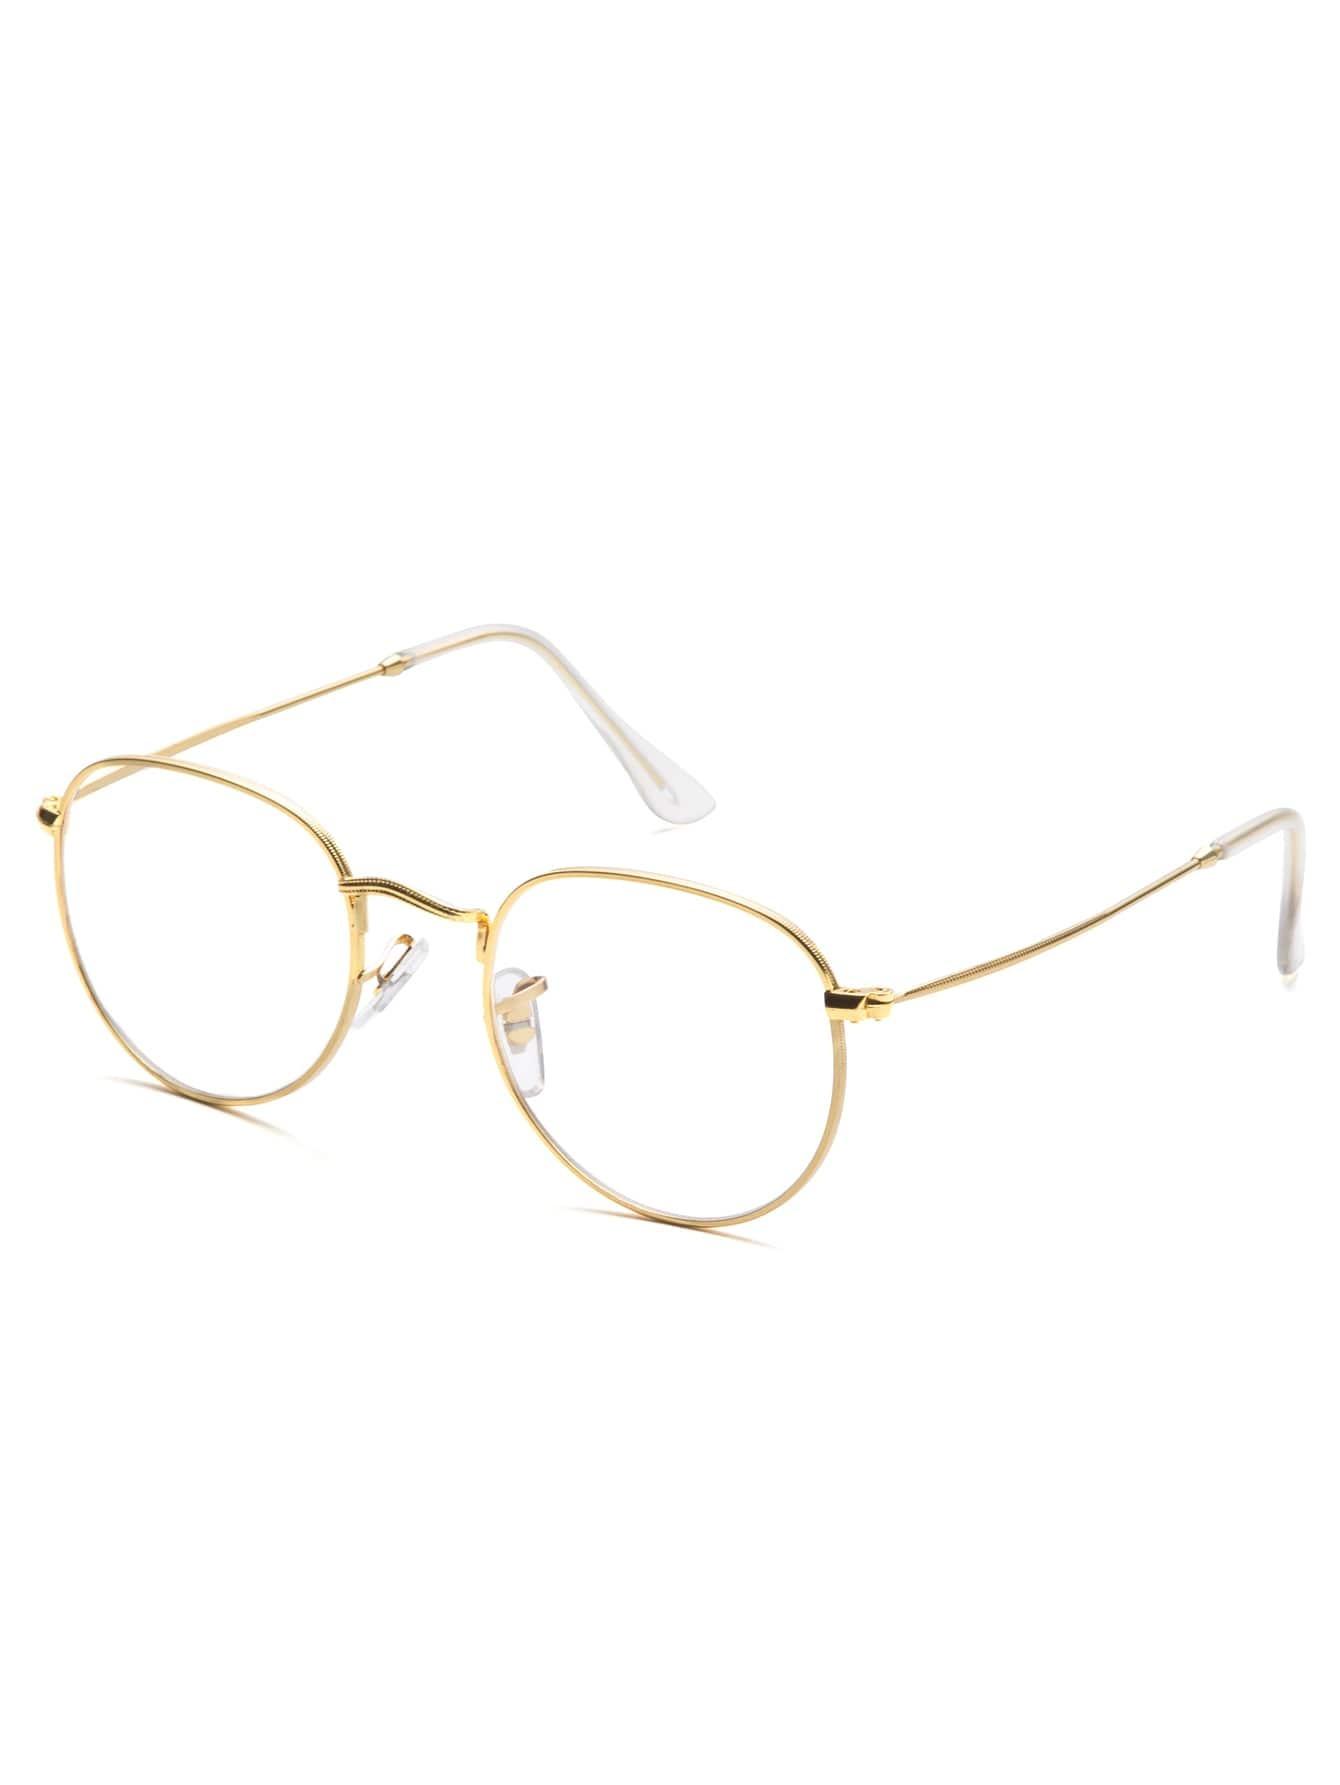 Gold Frame Clear Lens Glasses